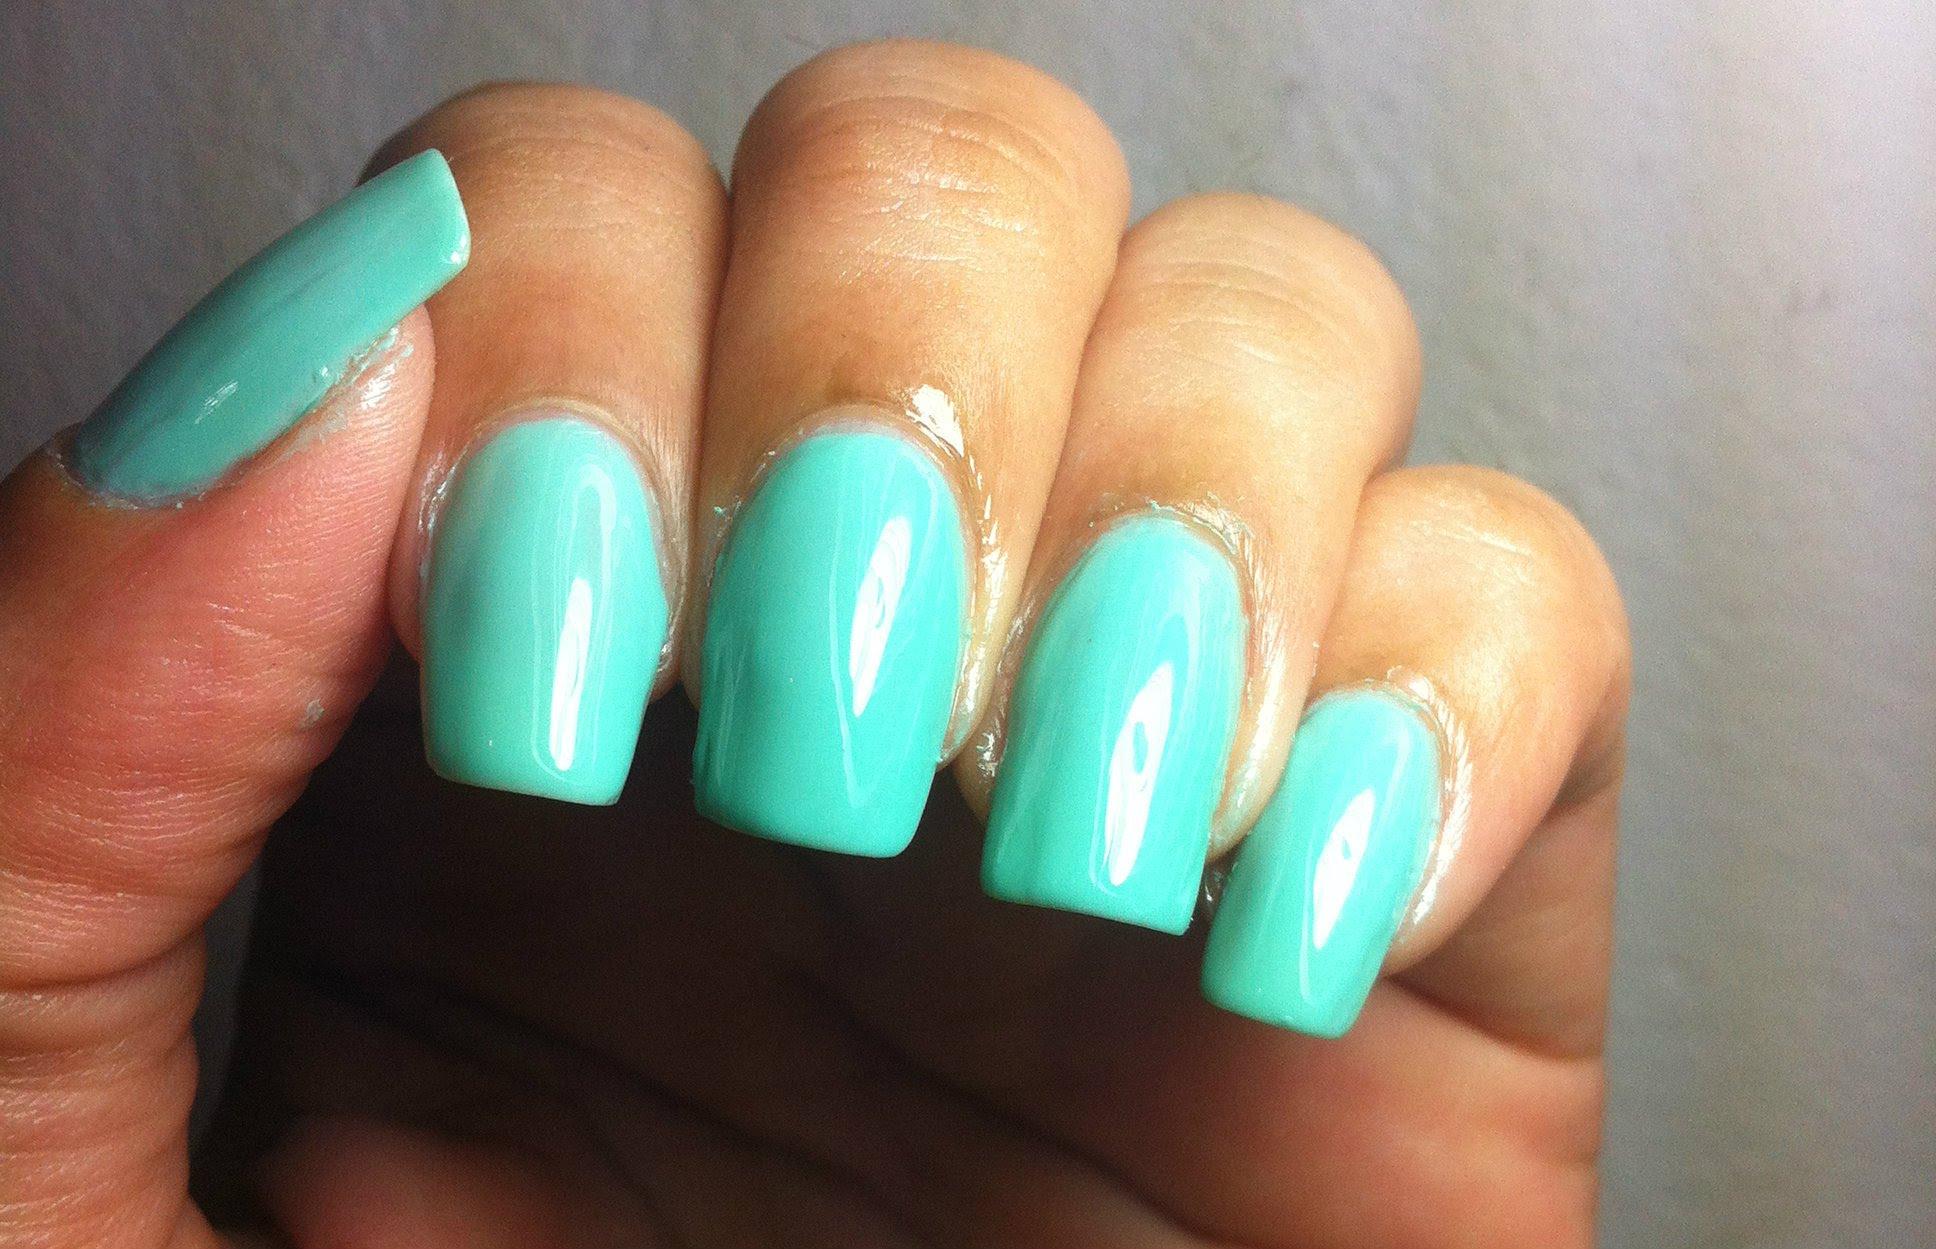 Como pintar as unhas sem borrar: truque simples e barato com vaselina